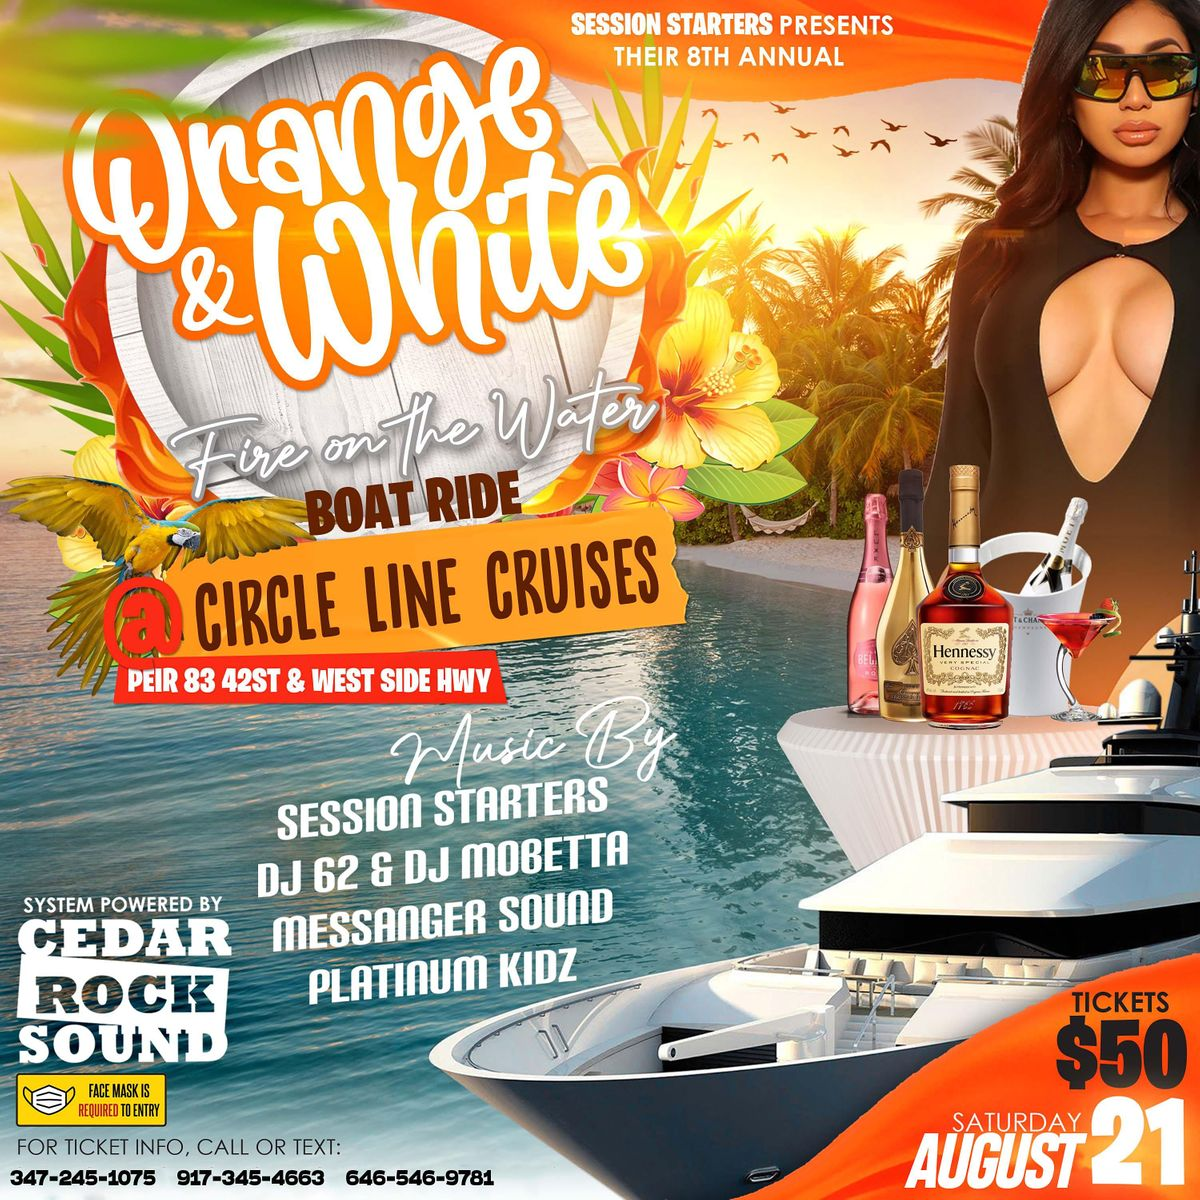 Orange & White Boatride